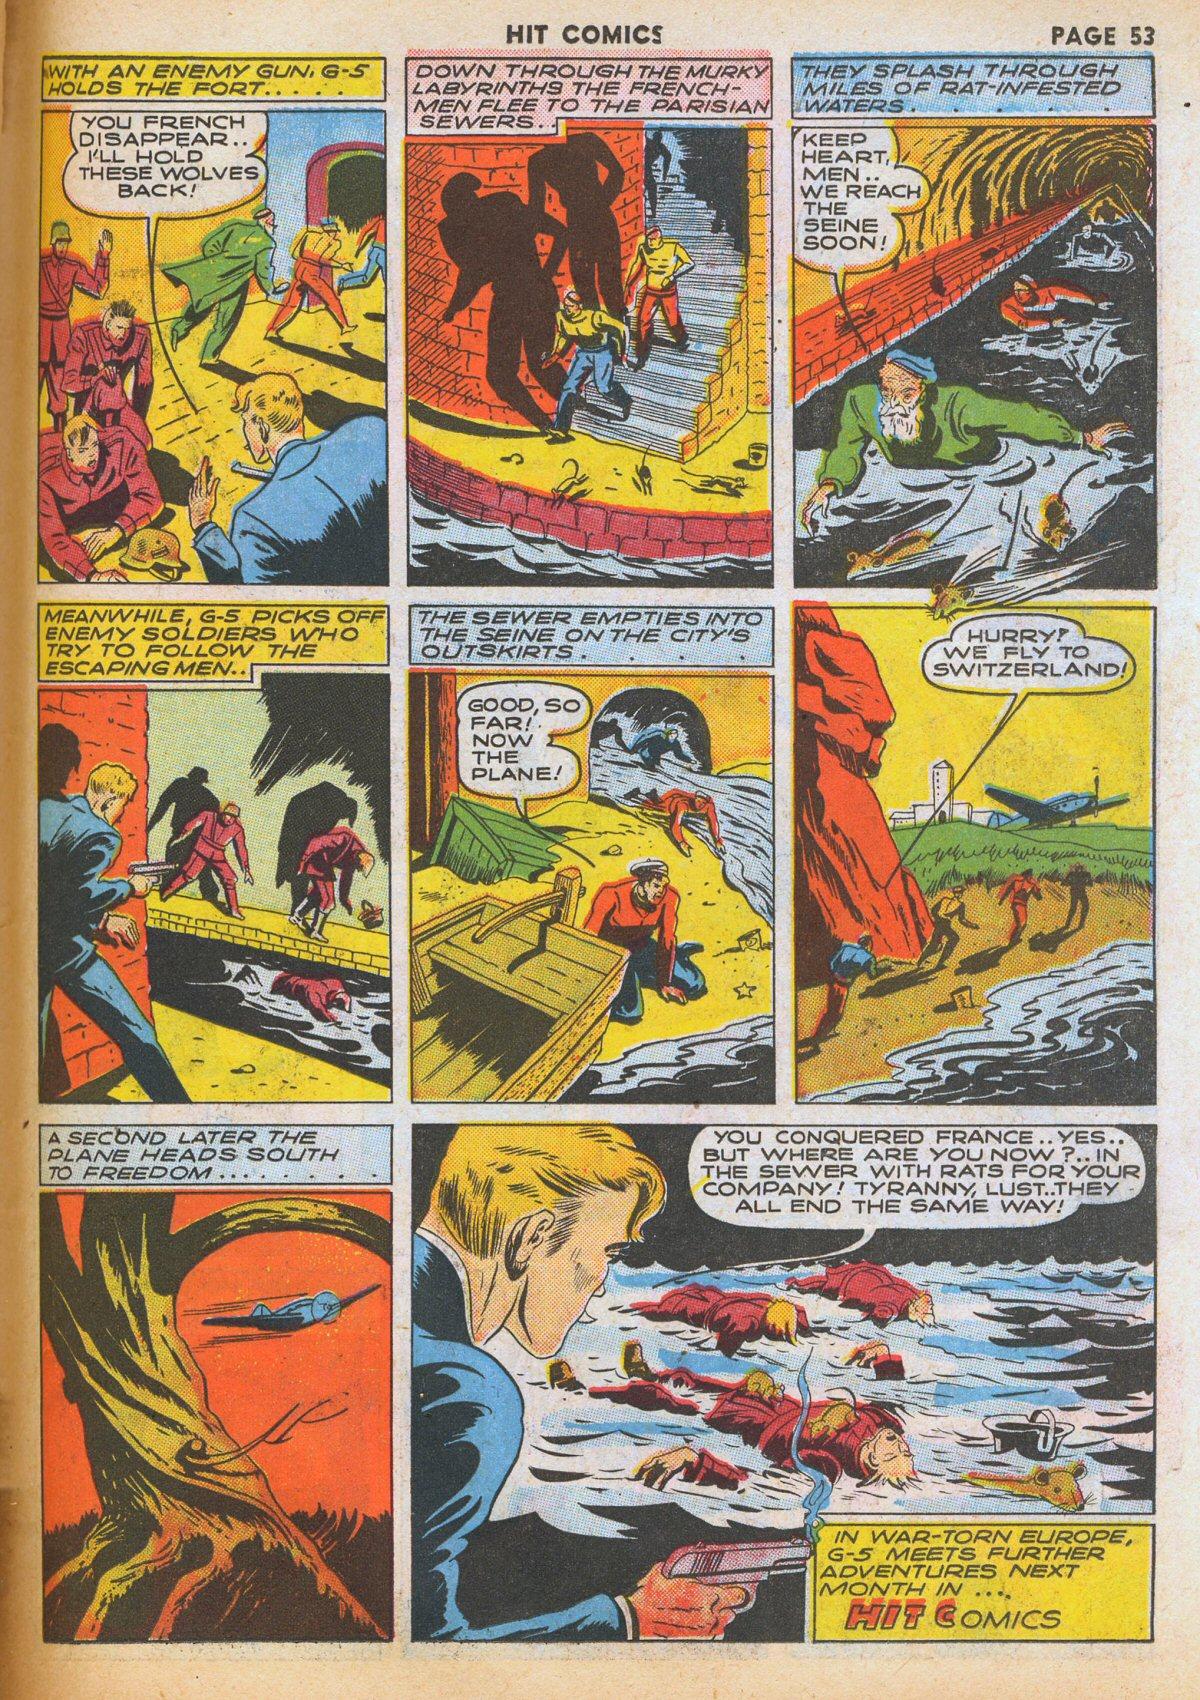 Read online Hit Comics comic -  Issue #12 - 55